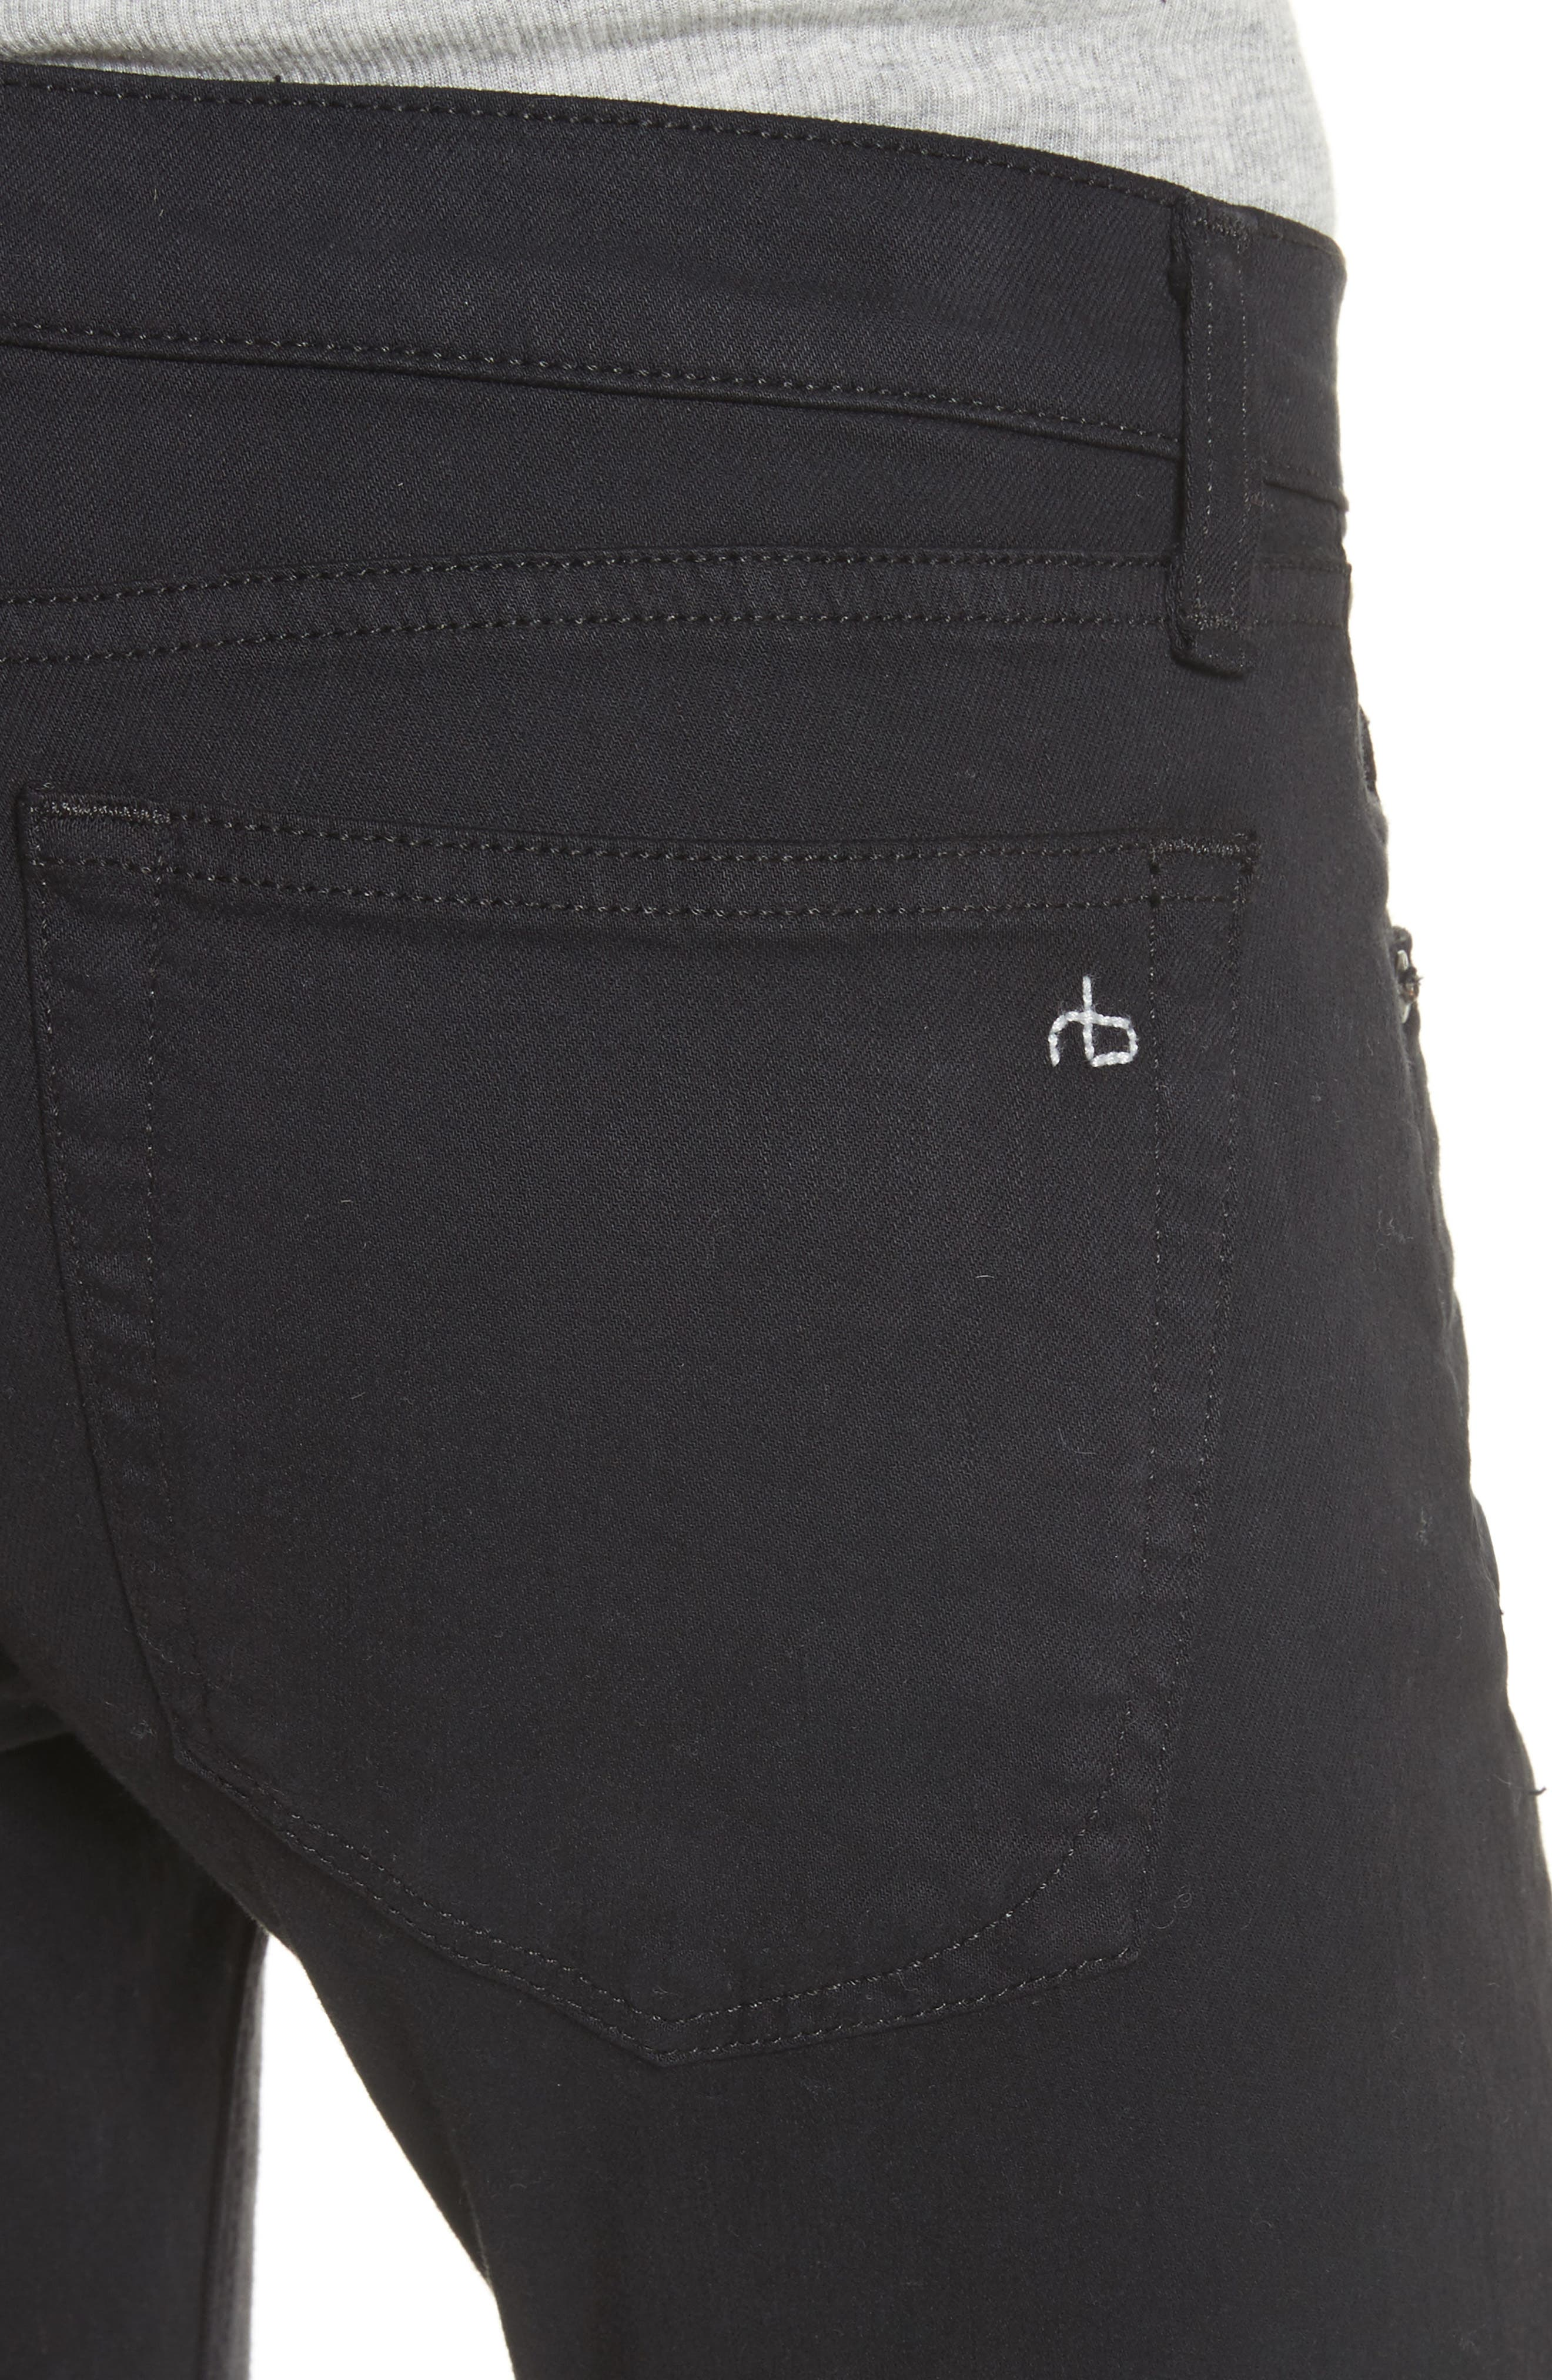 'The Dre' Skinny Jeans,                             Alternate thumbnail 10, color,